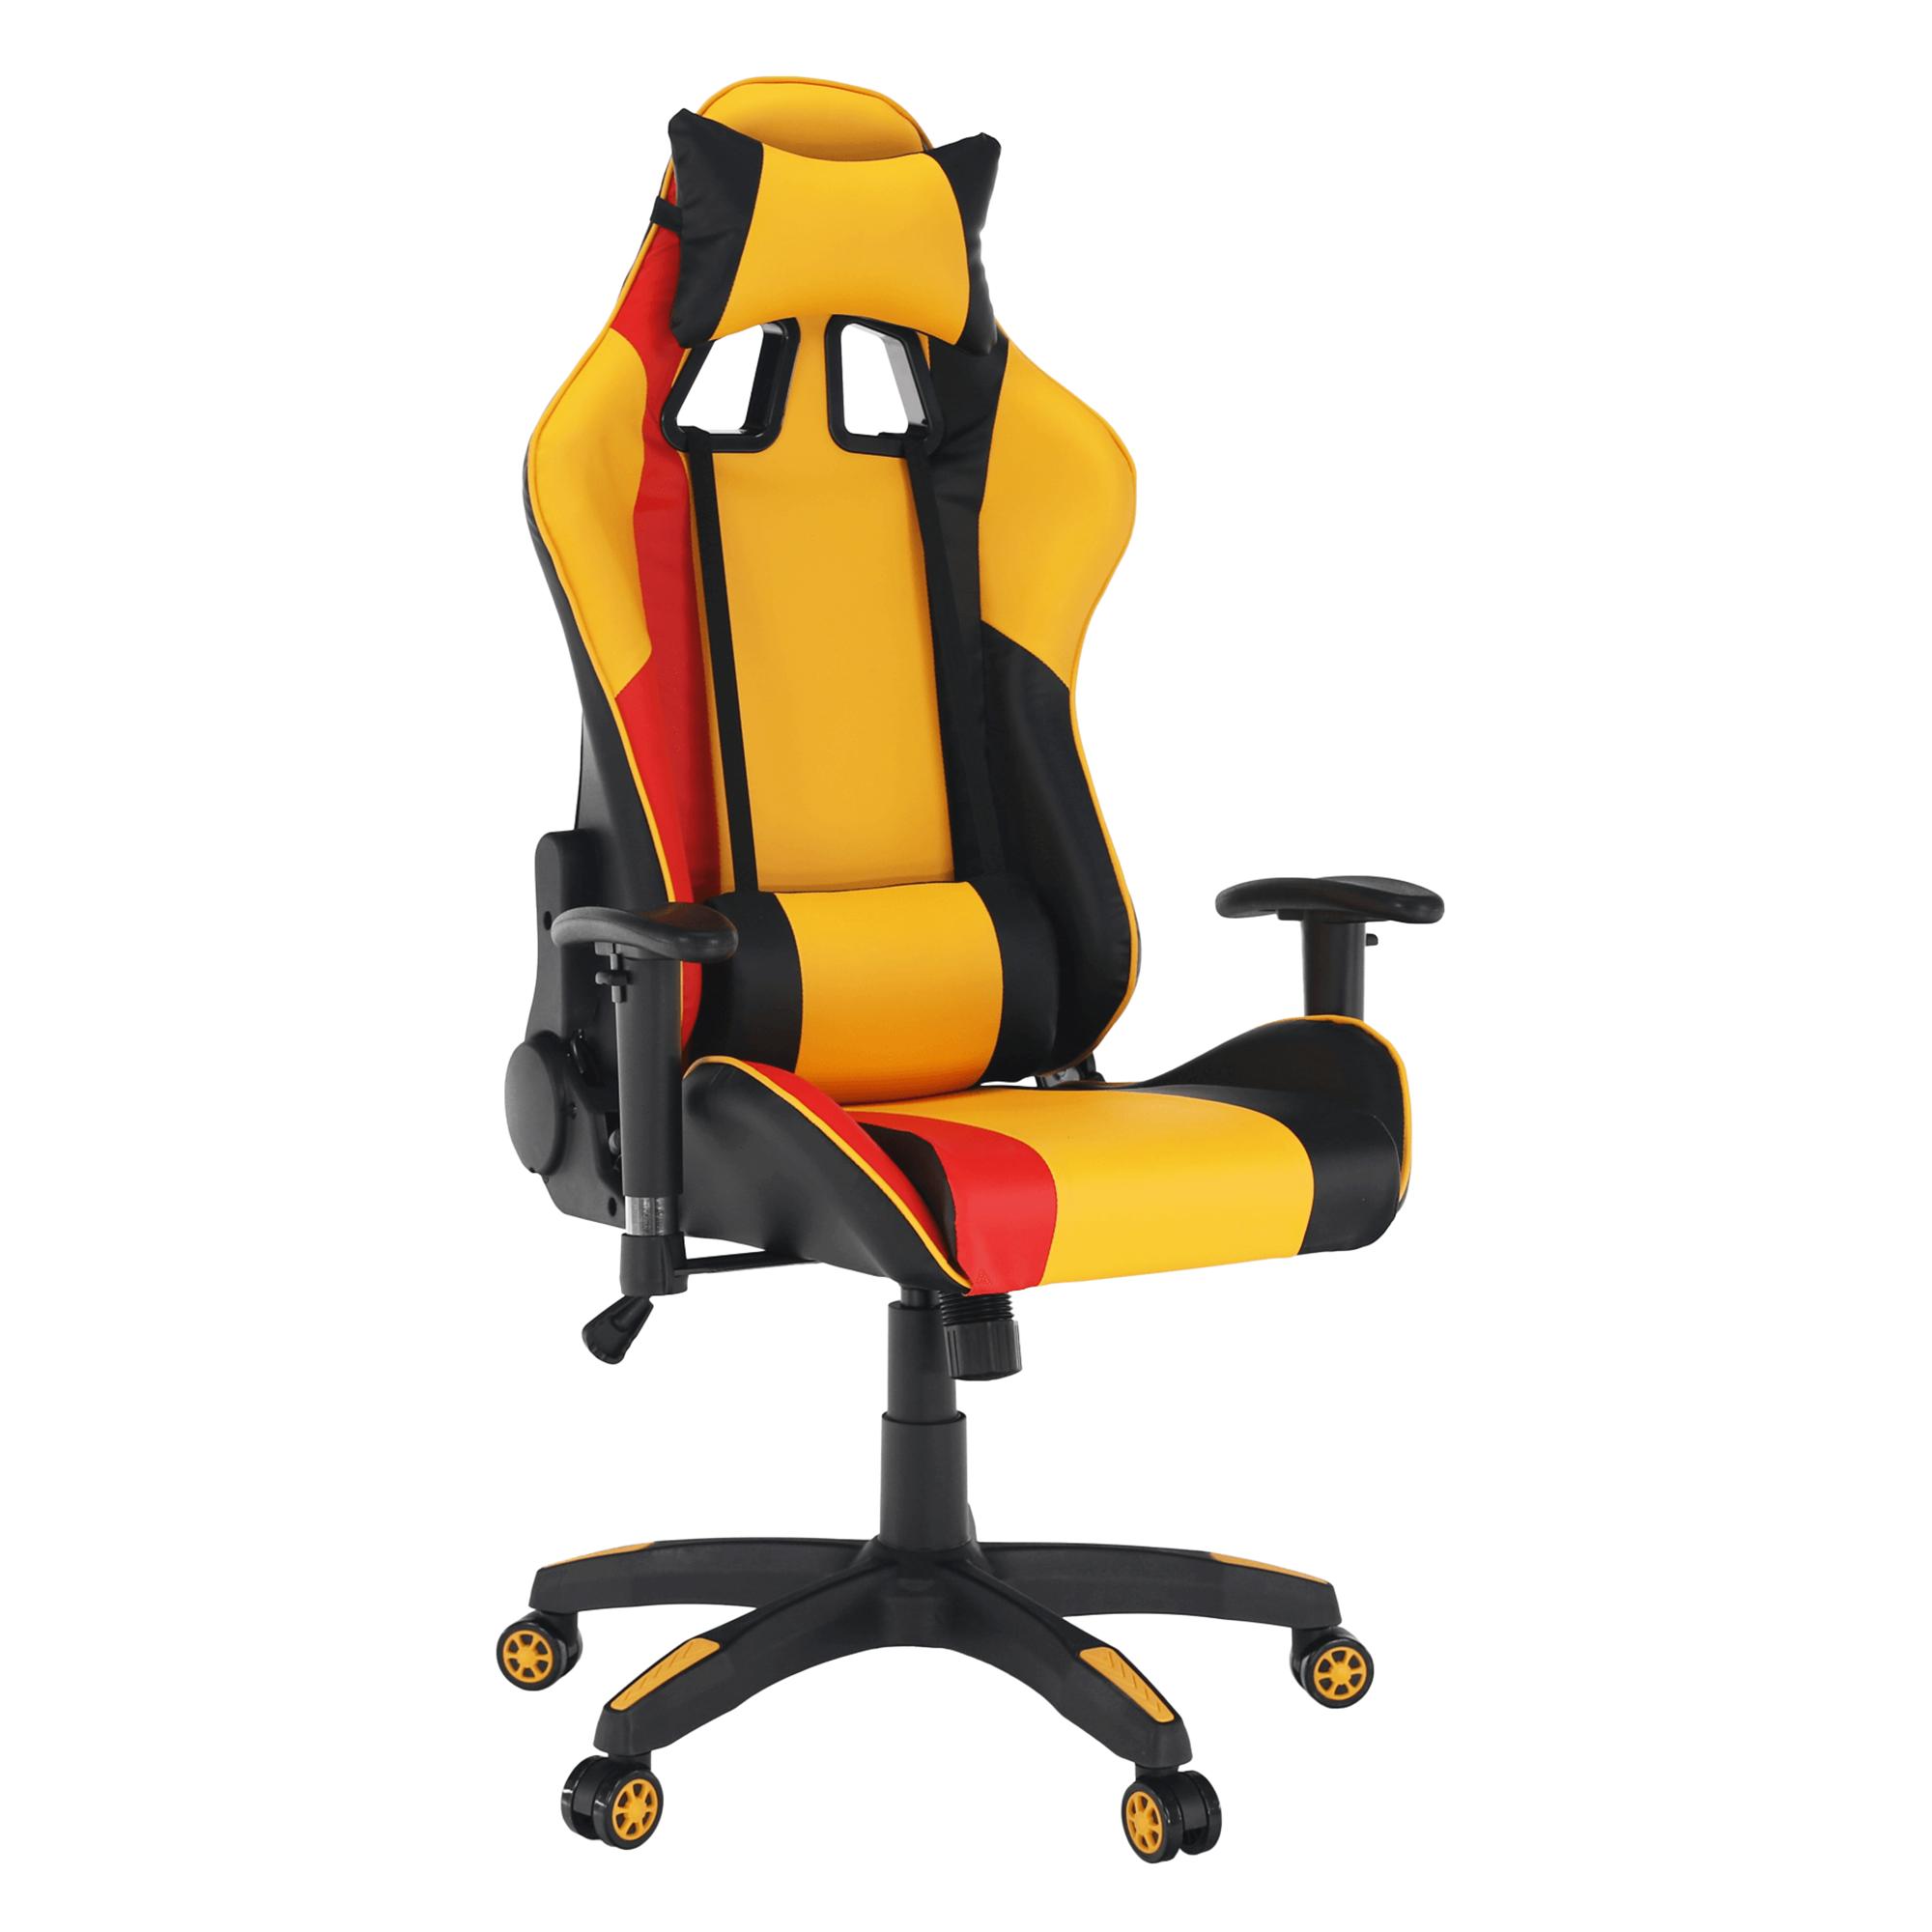 Fotoliu birou/gaming, galben/negru/portocaliu, SOLERO